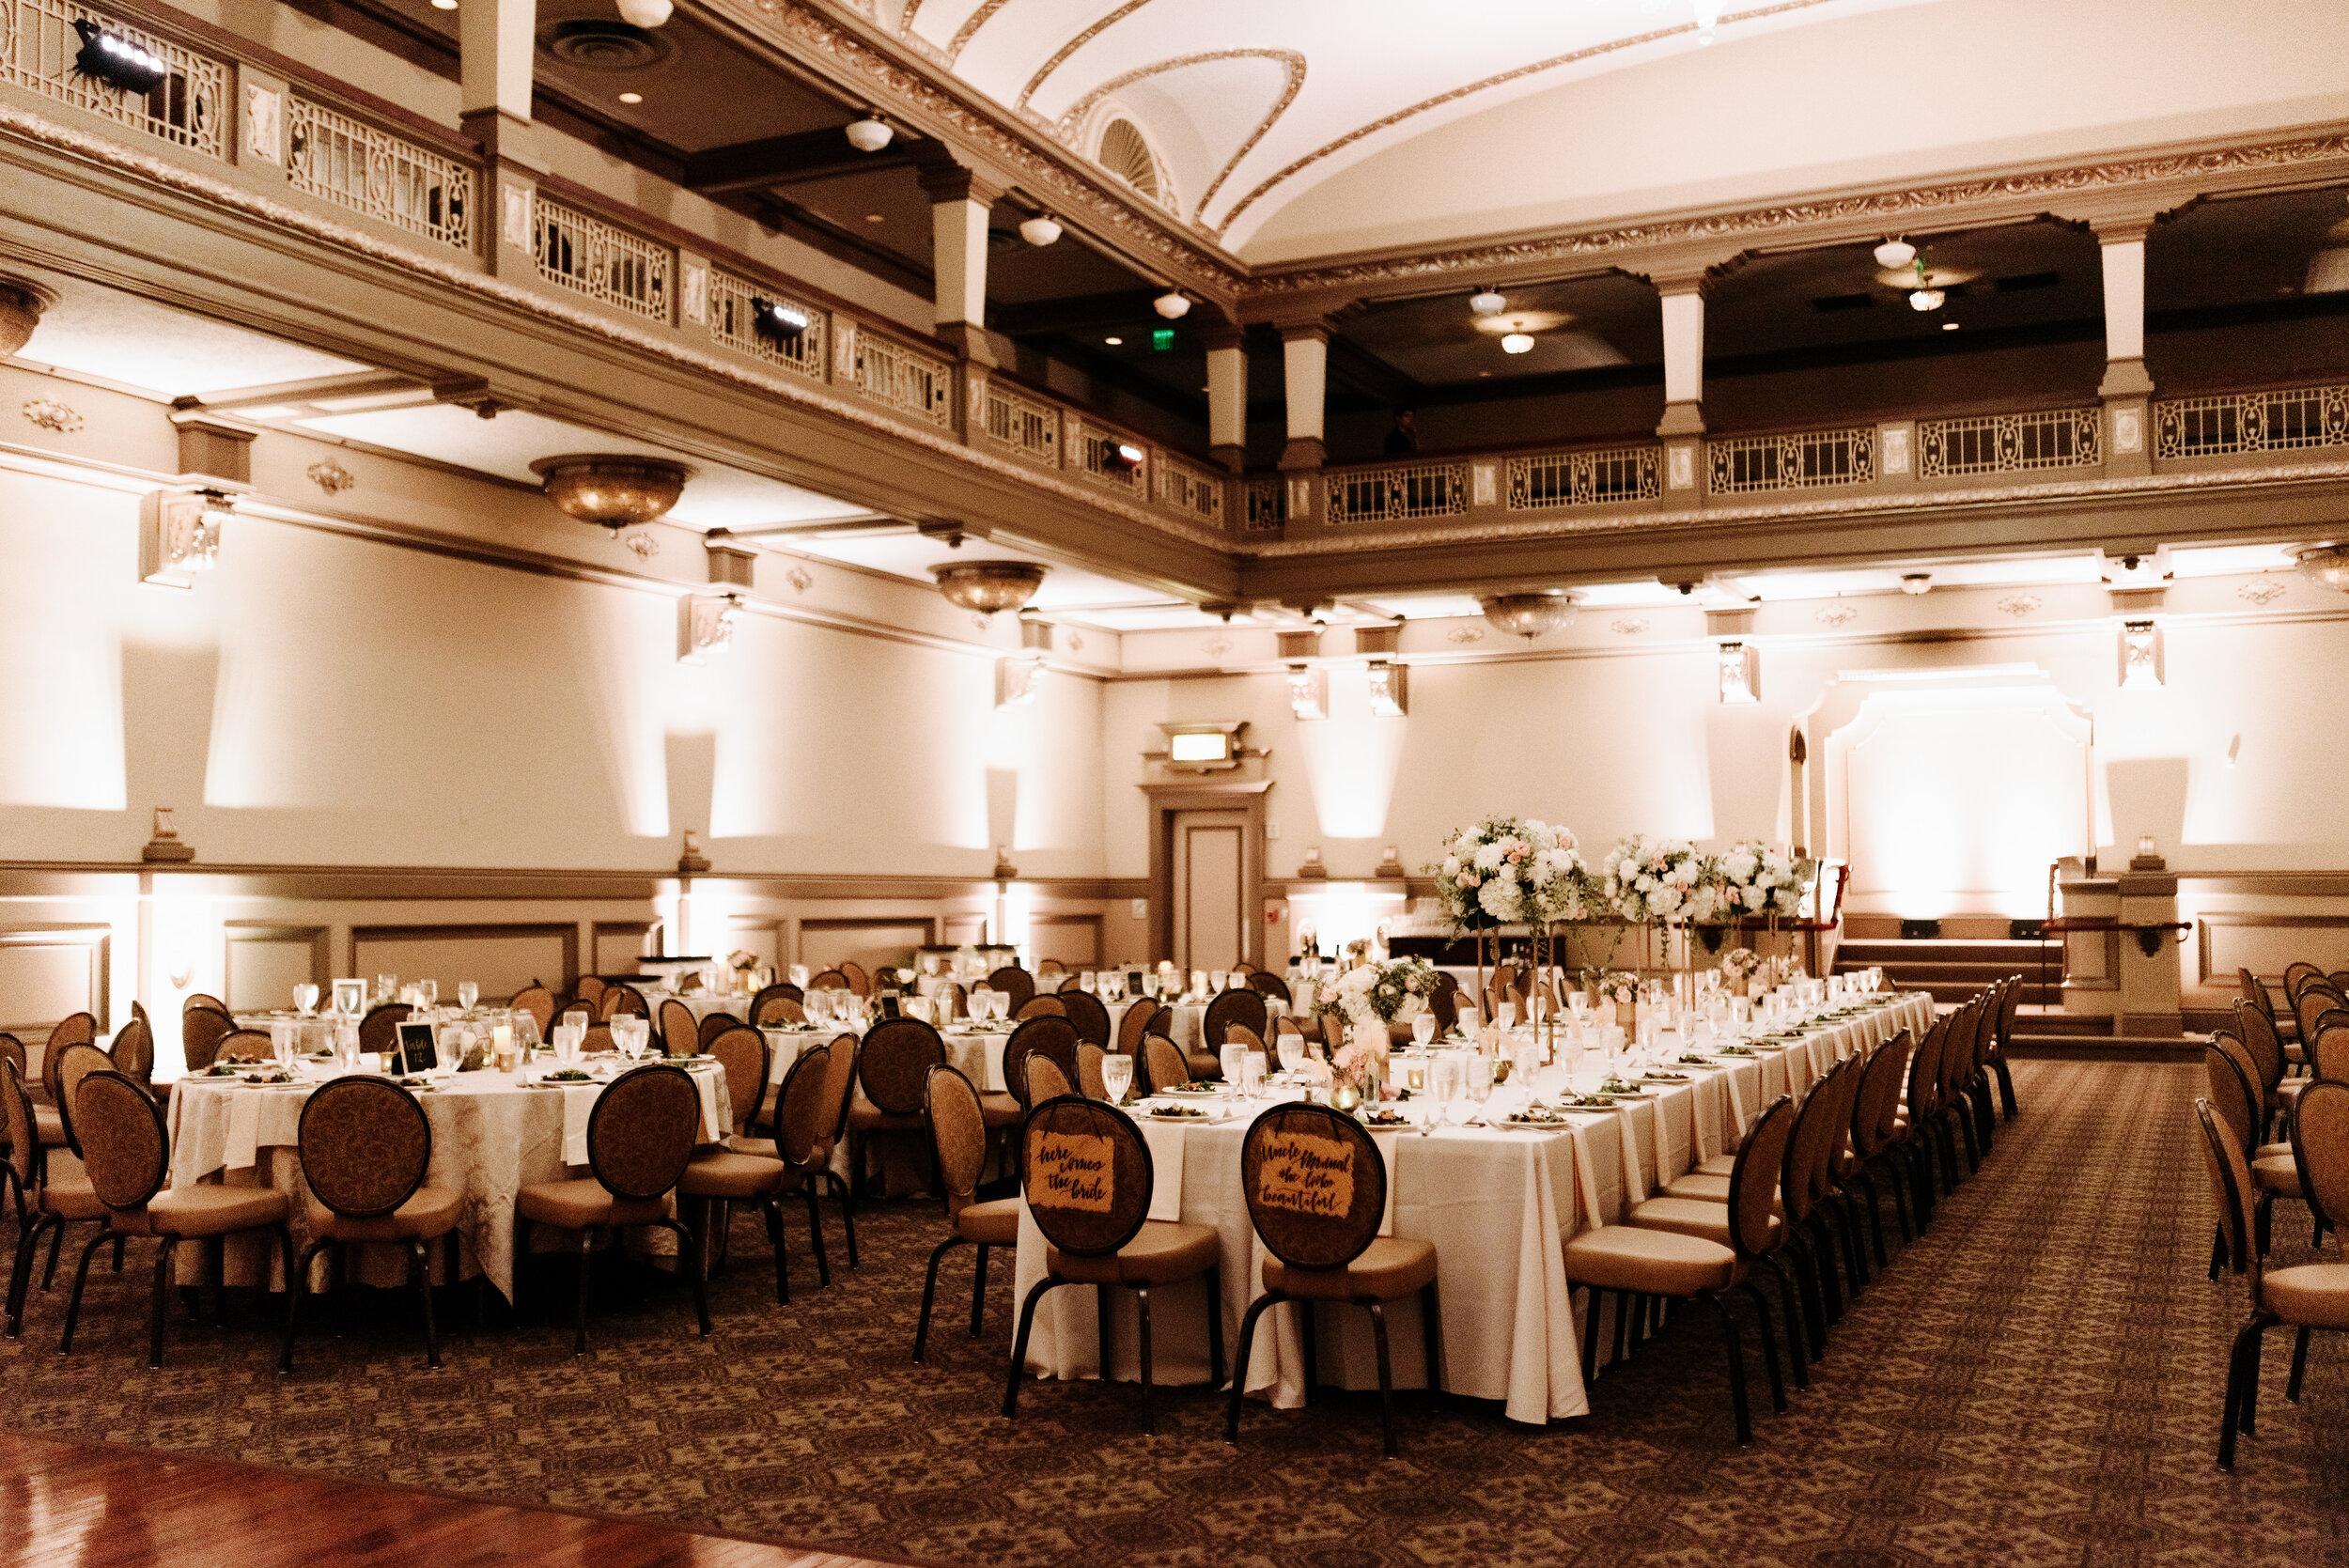 Cassie-Mrunal-Wedding-Quirk-Hotel-John-Marshall-Ballrooms-Richmond-Virginia-Photography-by-V-84.jpg